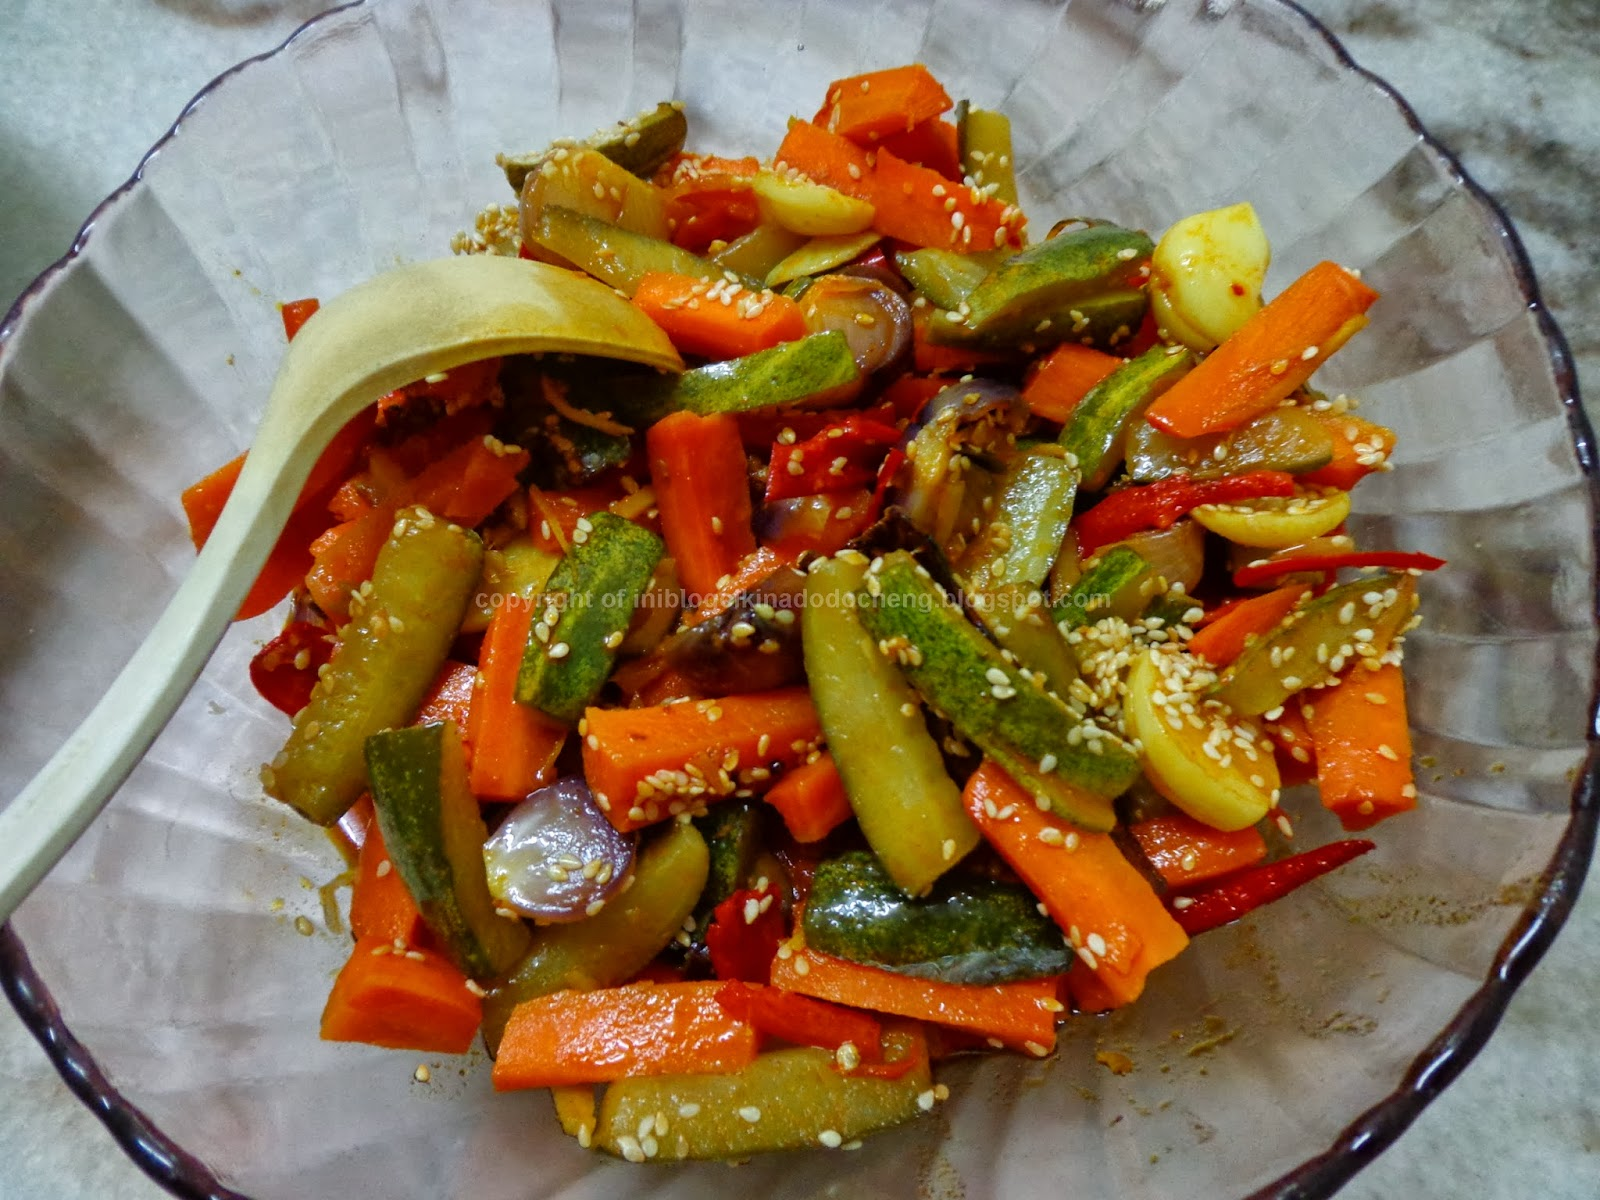 Resepi Ayam Masak Halia Chef Wan - S Wagon RX